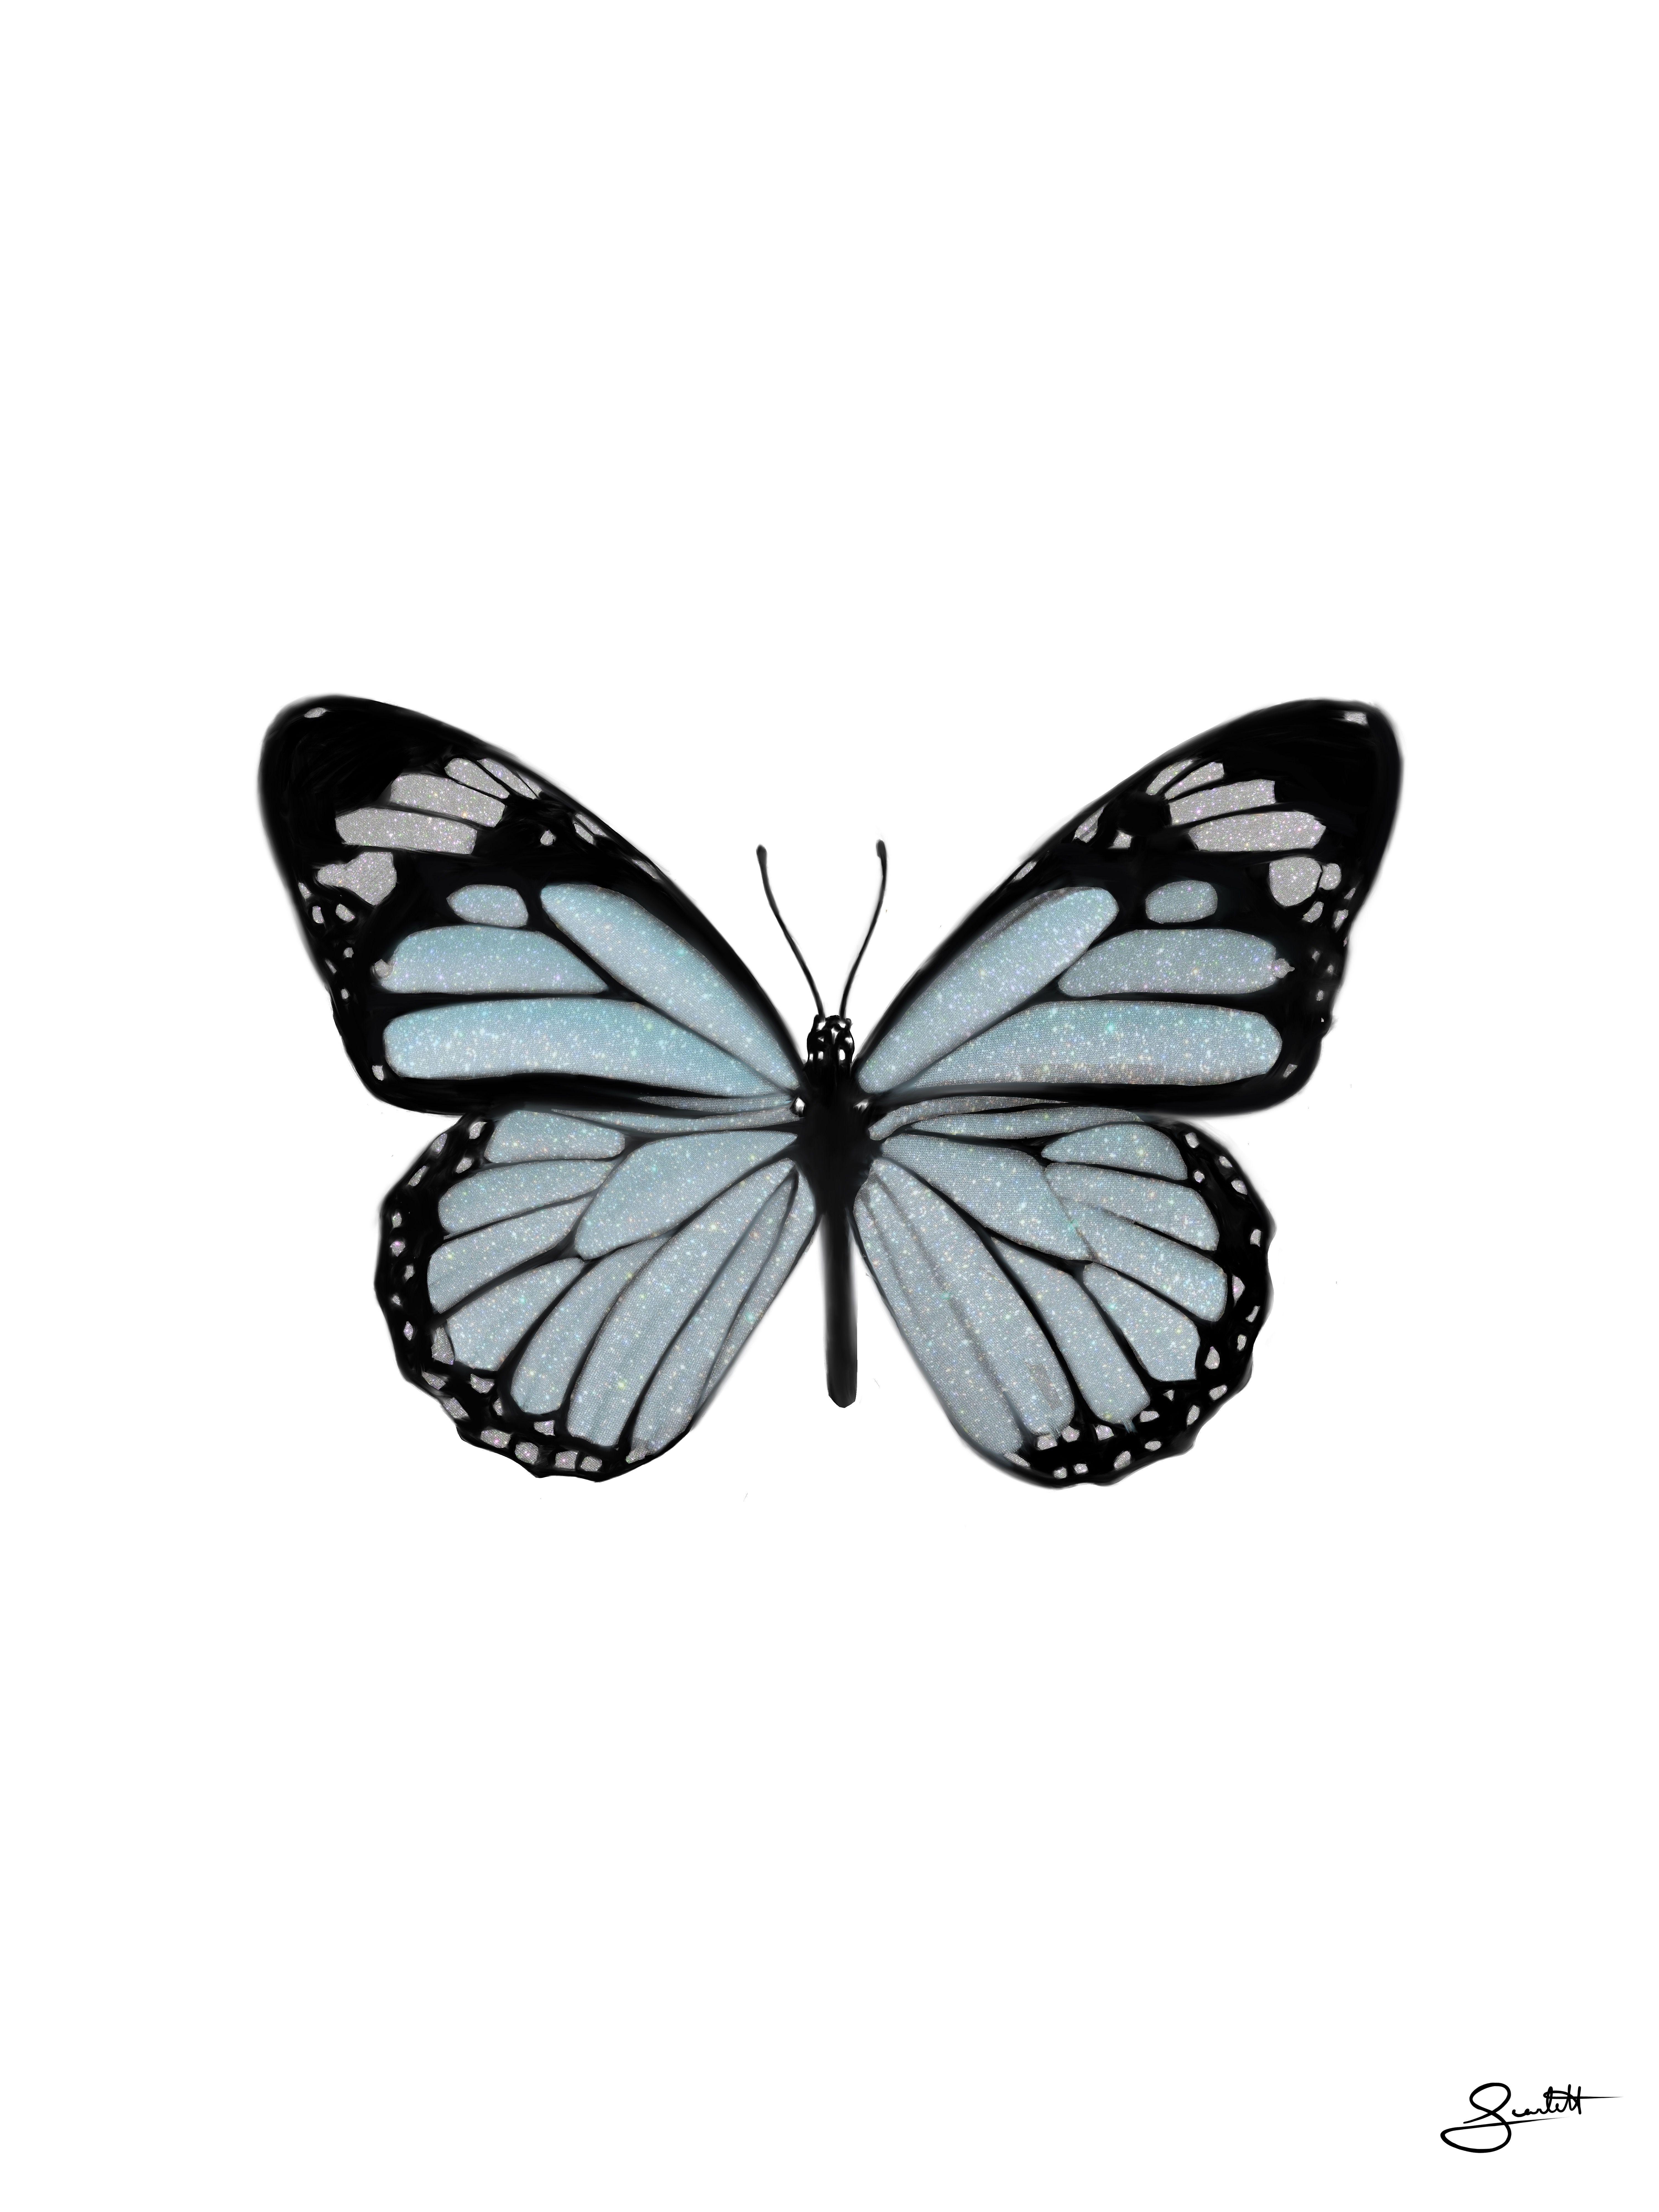 25c16c9e7a49c5f4cceebf19fe67c45f » Butterfly Drawing Aesthetic